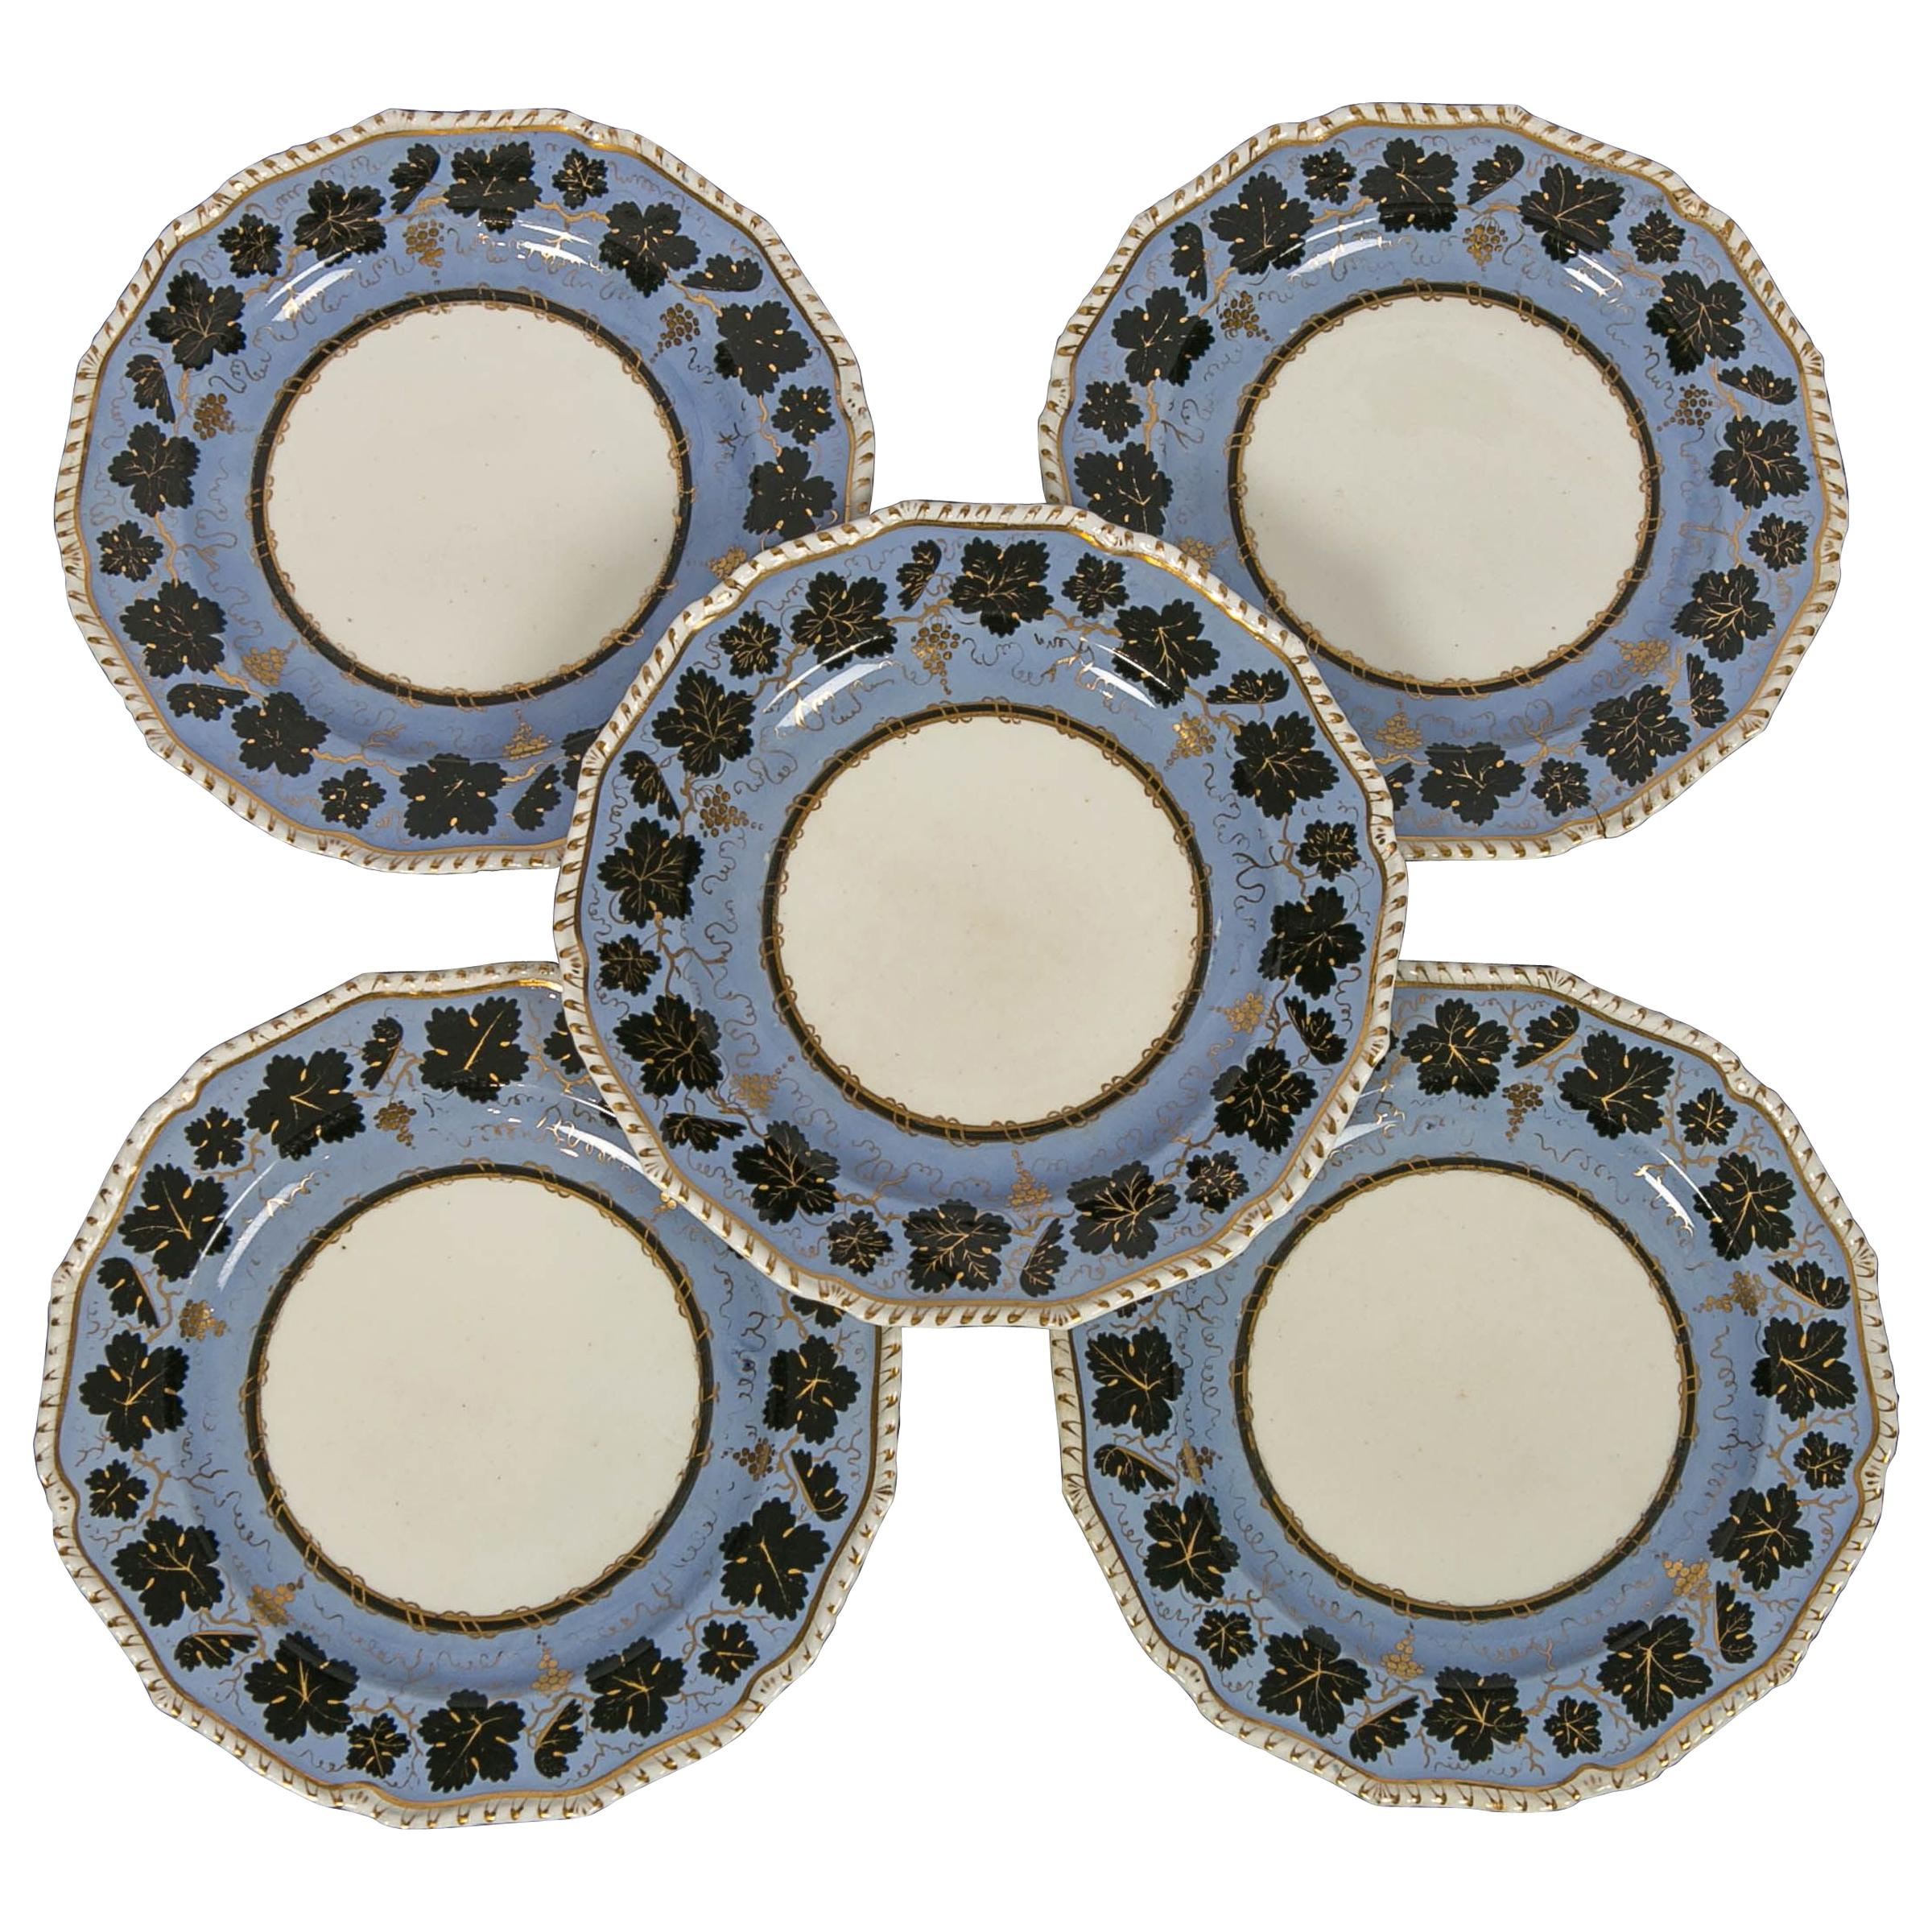 Set of Twelve Derby Cornflower Blue Dishes Made England circa 1830